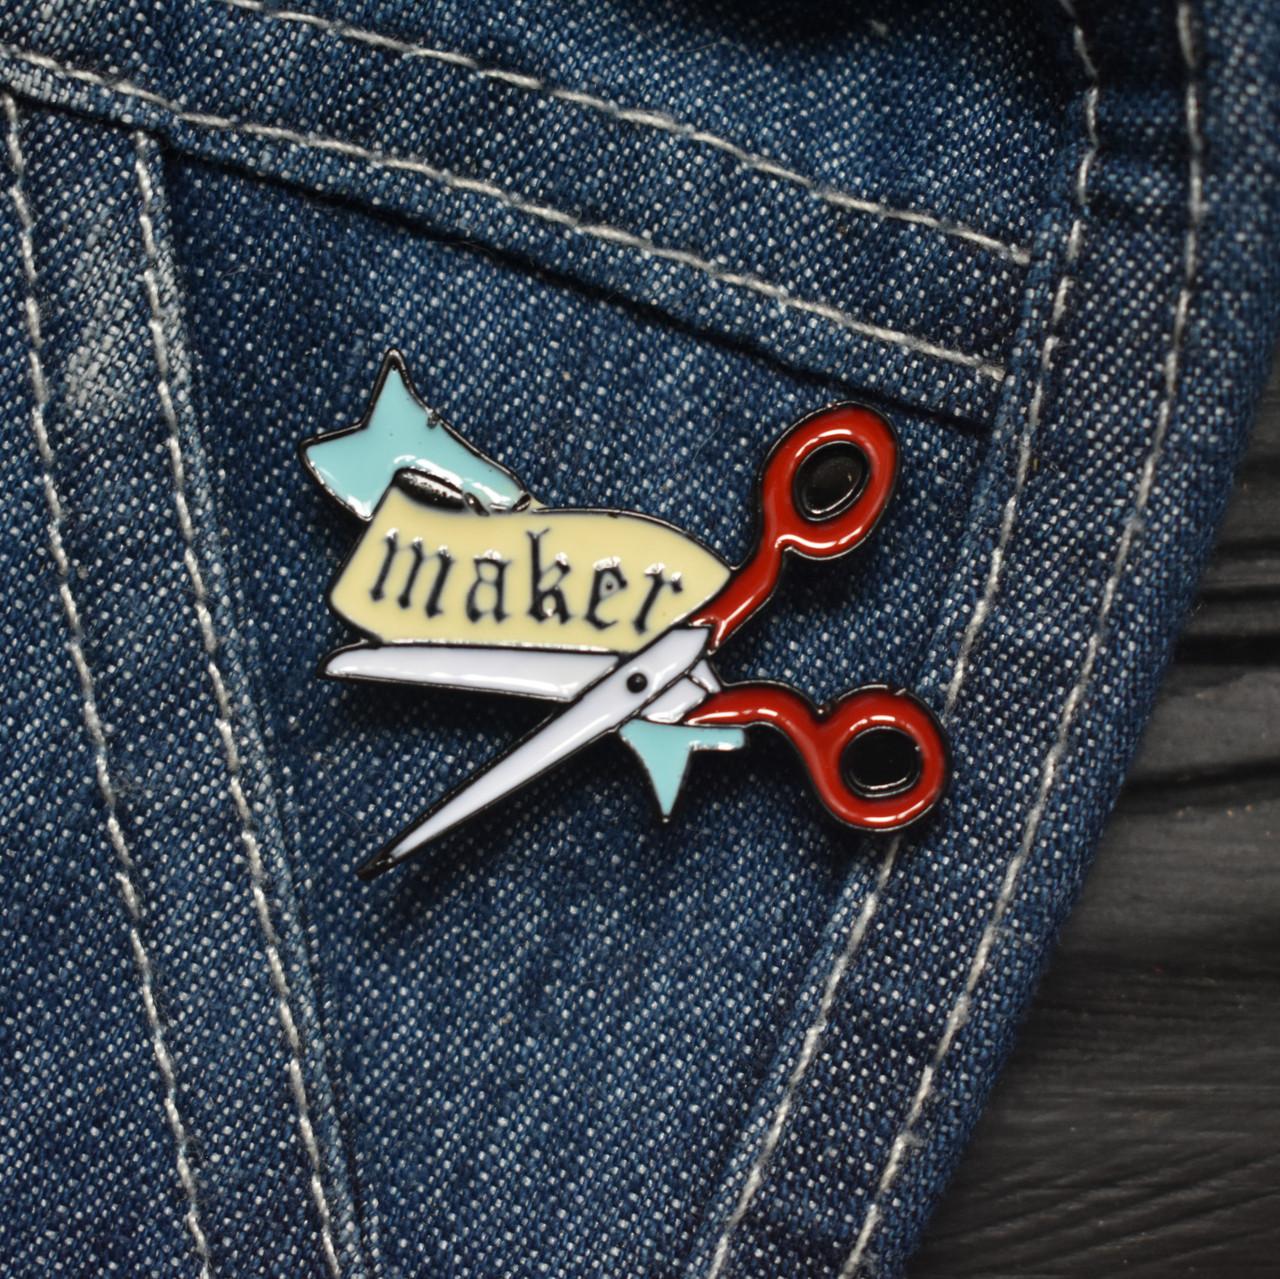 "Значок, брошка-значок, пін з металу на одяг, металевий значок ""Maker"""